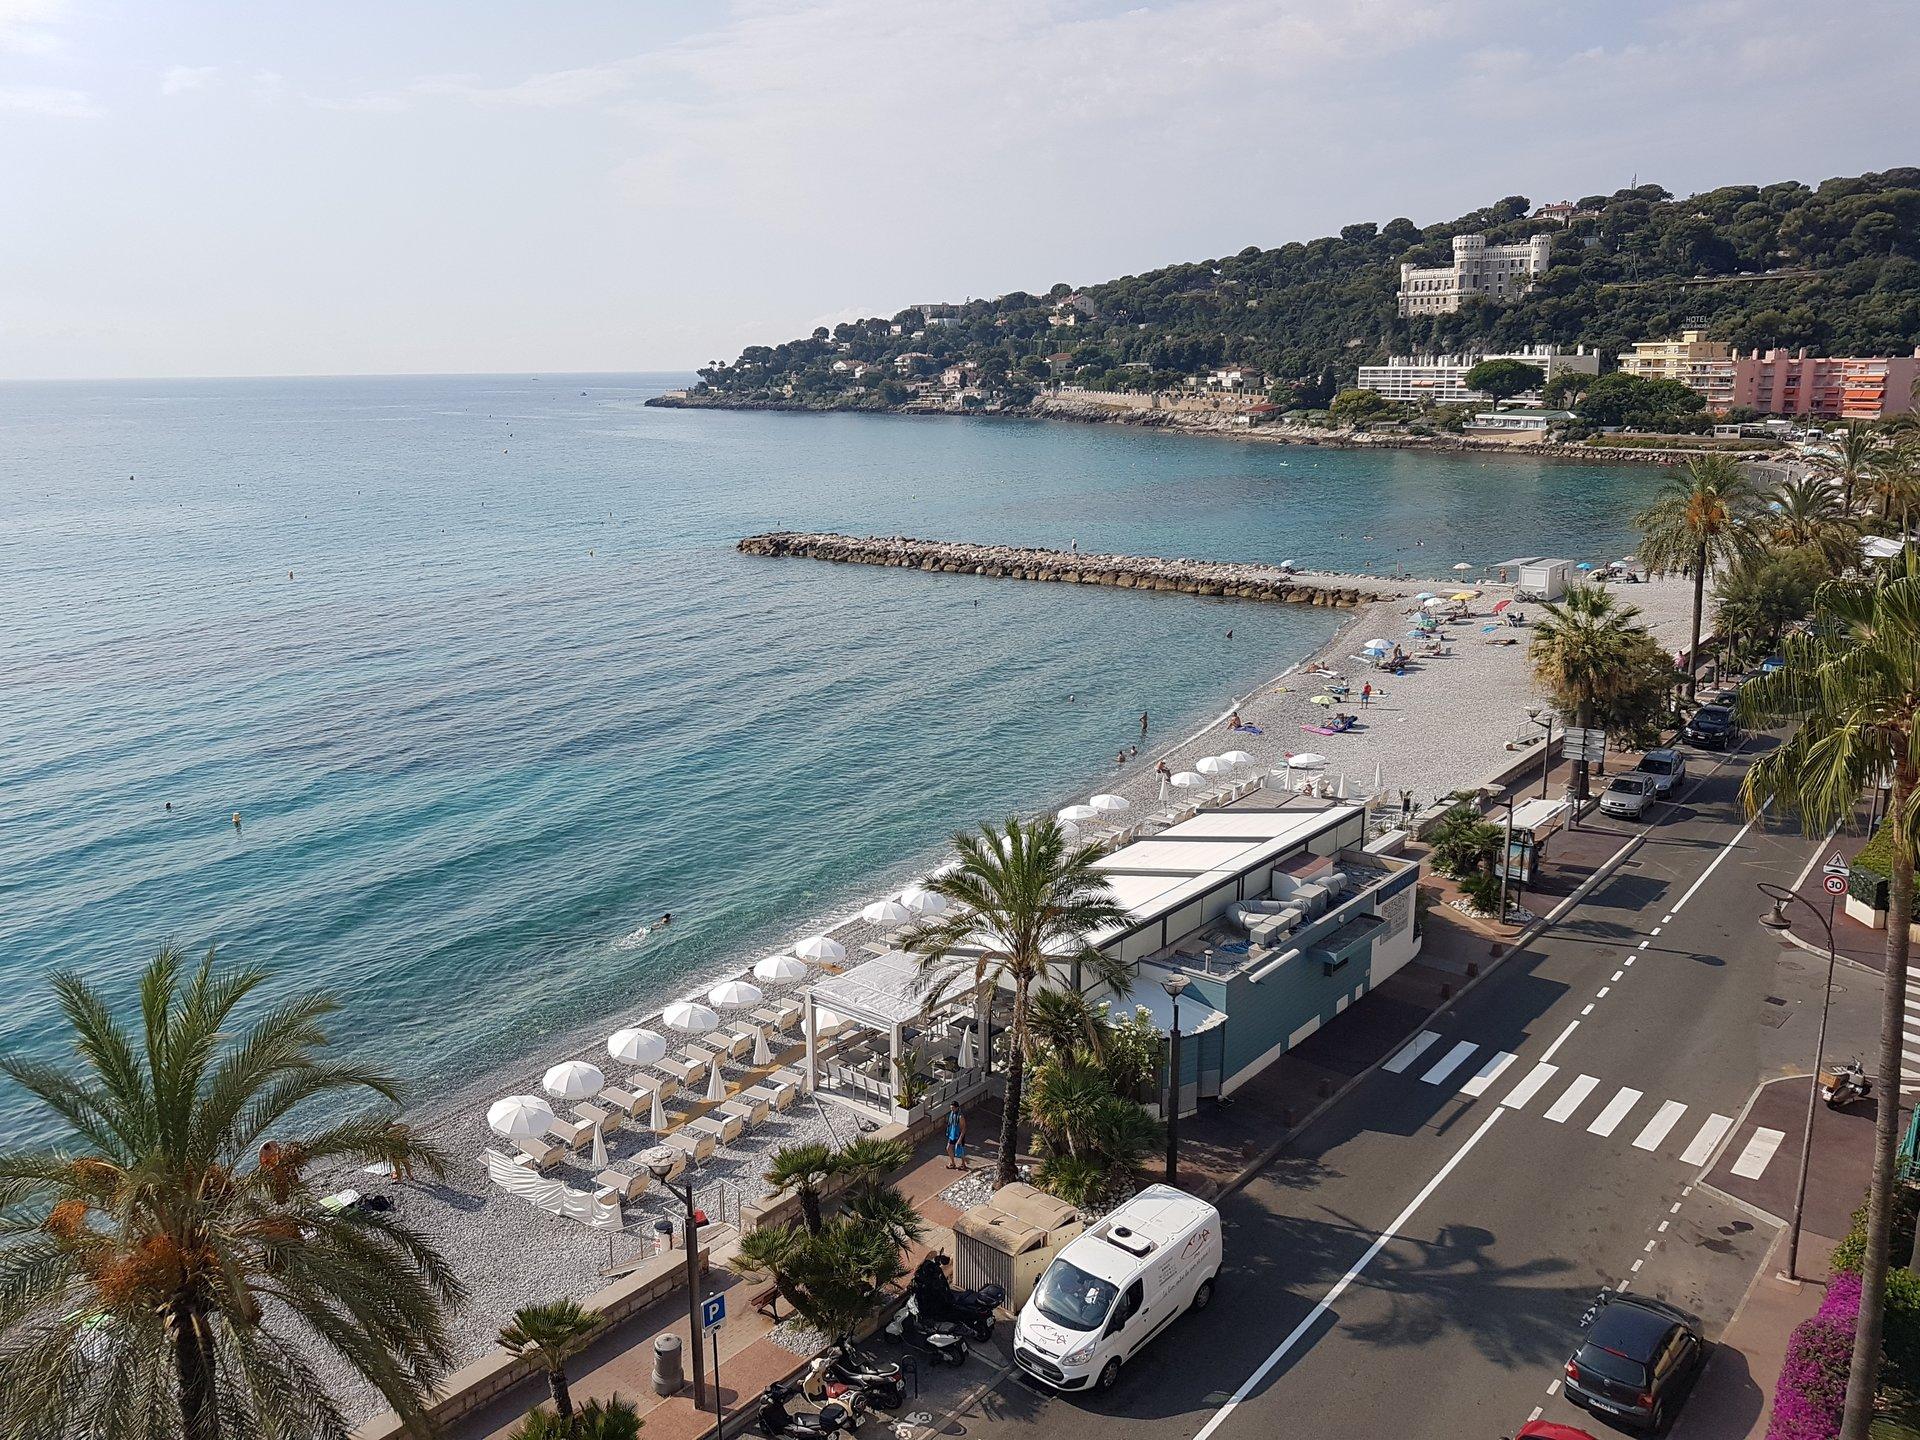 Roquebrune-Cap-Martin dernier étage front de mer